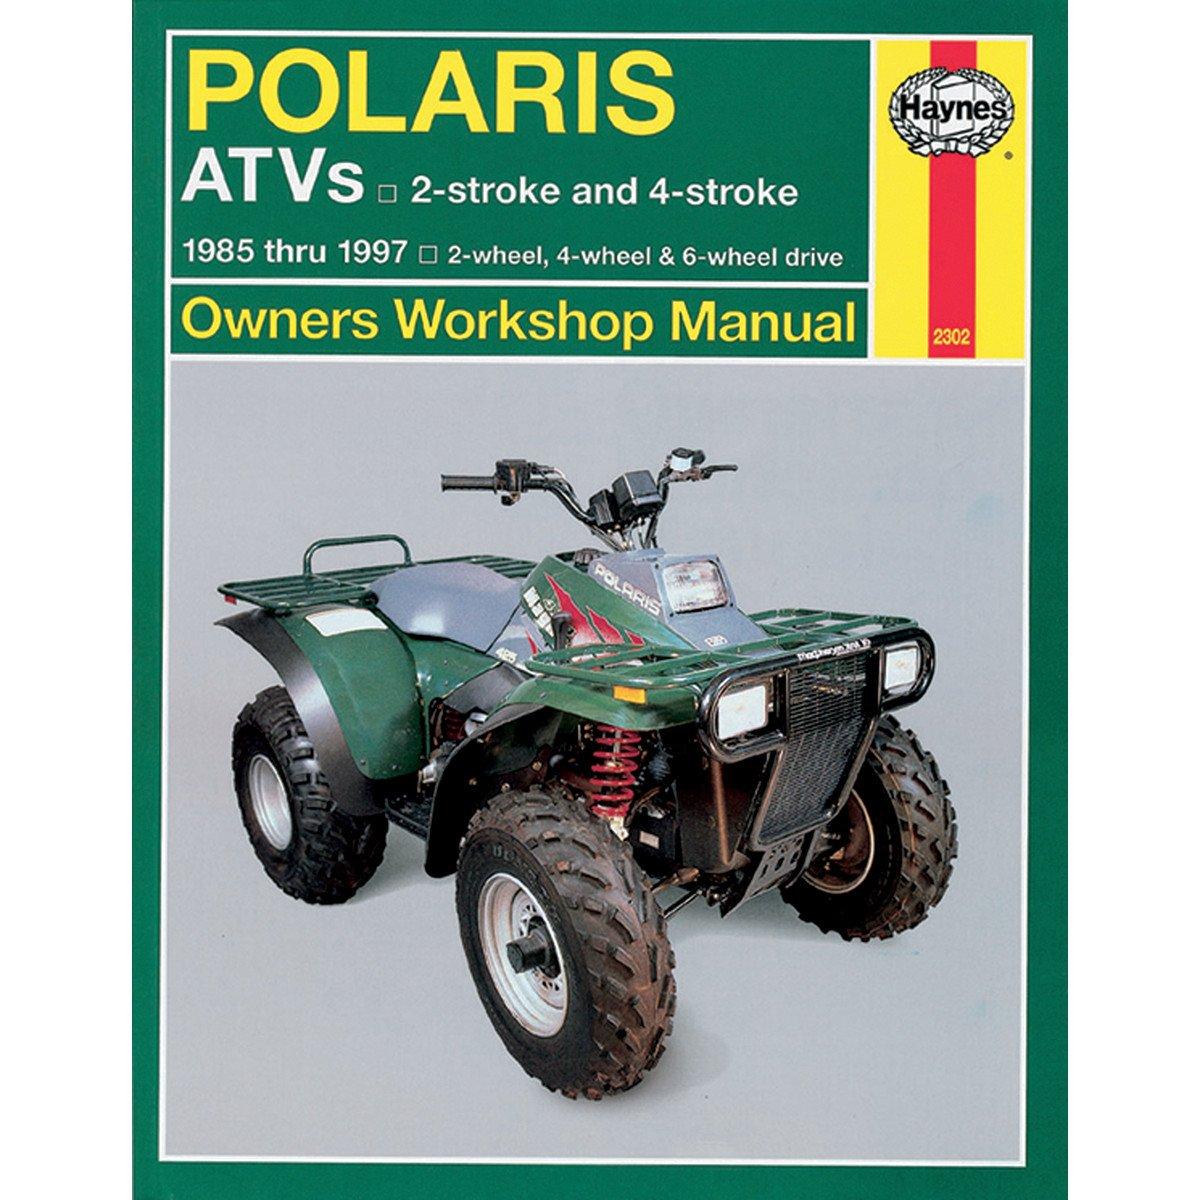 Haynes 2302 Repair Service Manual Polaris Atvs All 1999 Sportsman 500 Igntion Wiring Diagram 1985 1997 Automotive